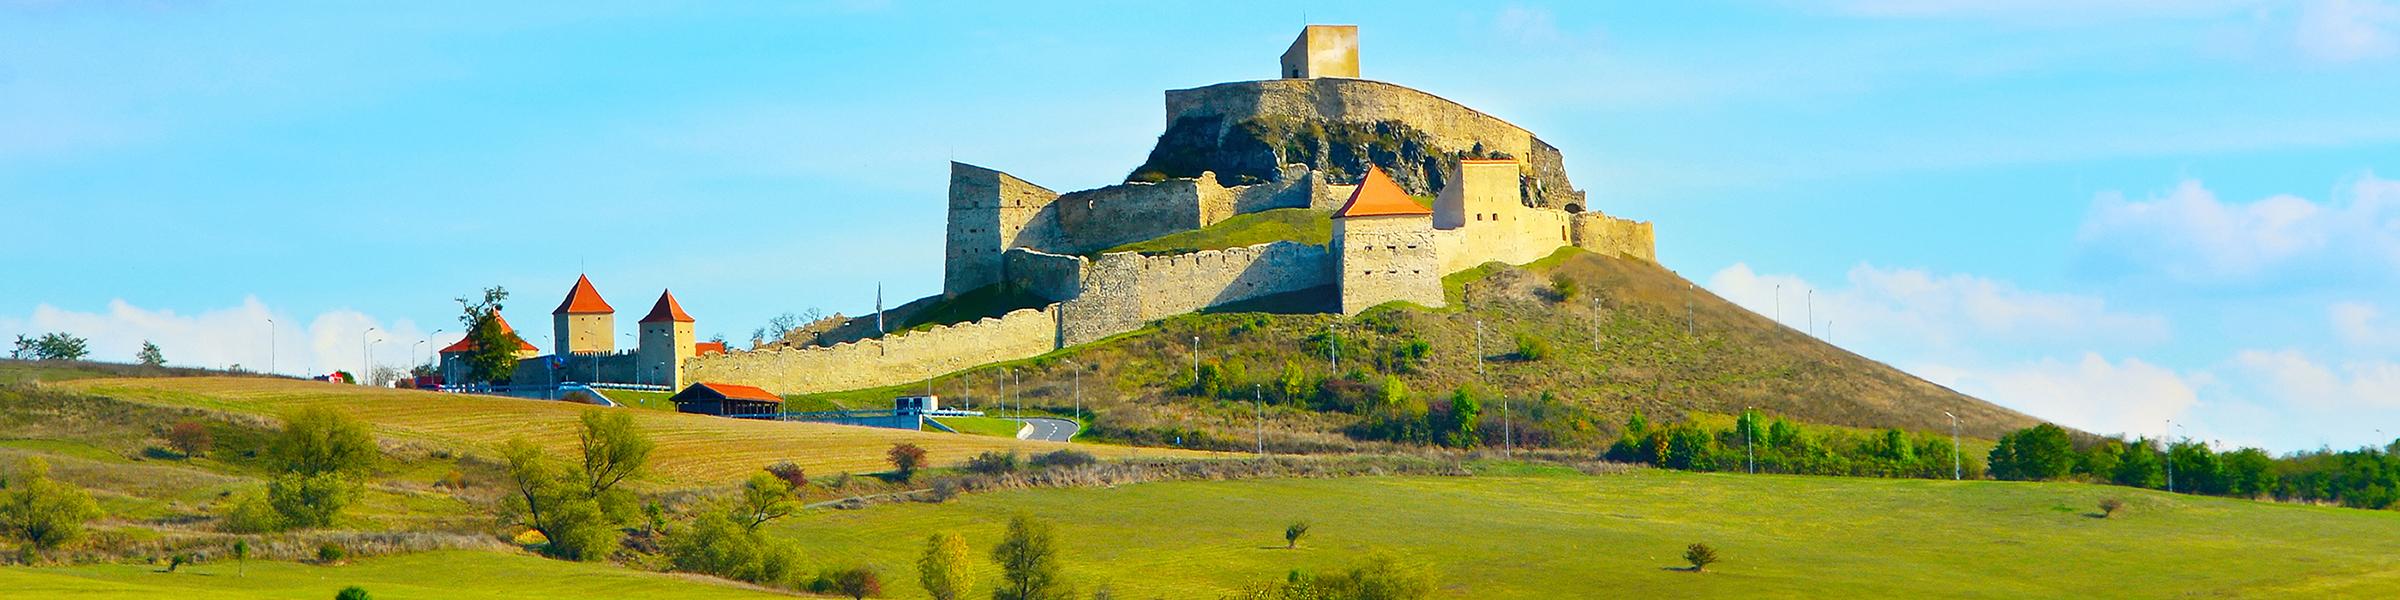 Romania Rupea Citadel